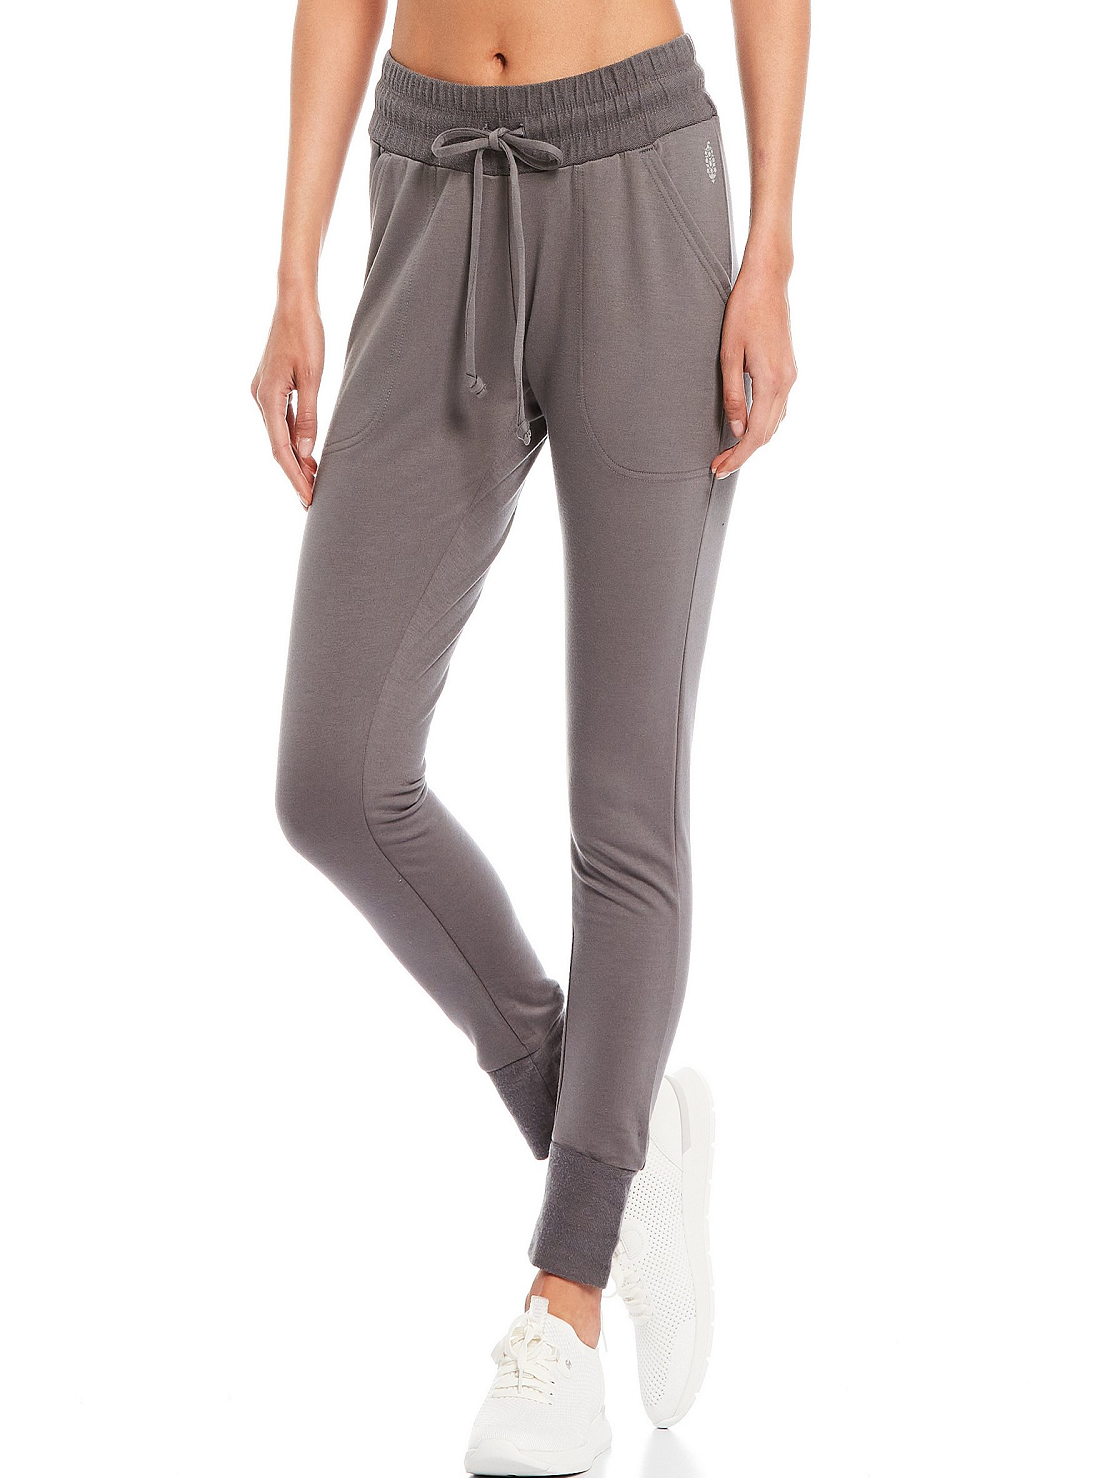 Wholesale Women's Leggings Jogger Pants